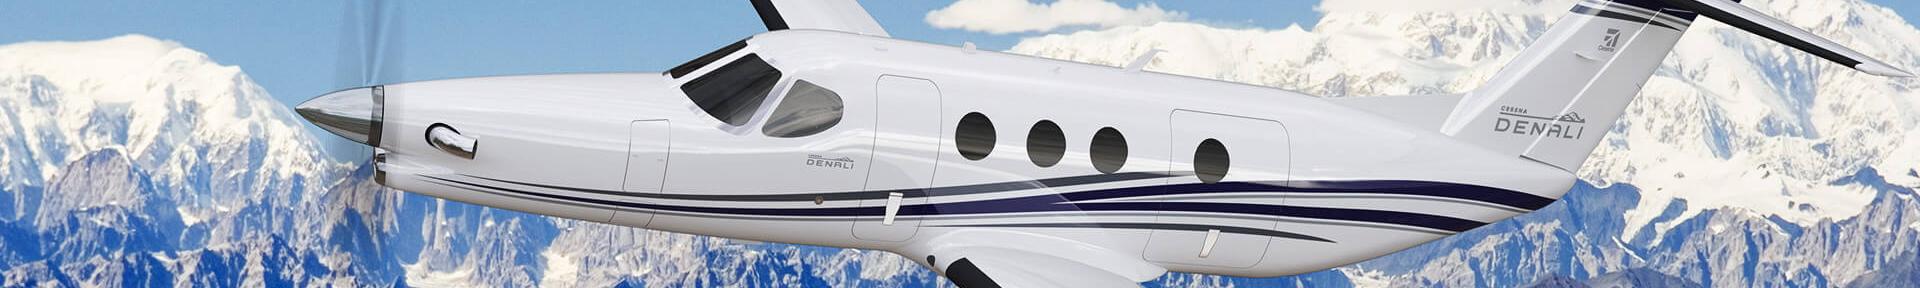 Cessna Denali Turbo Prop